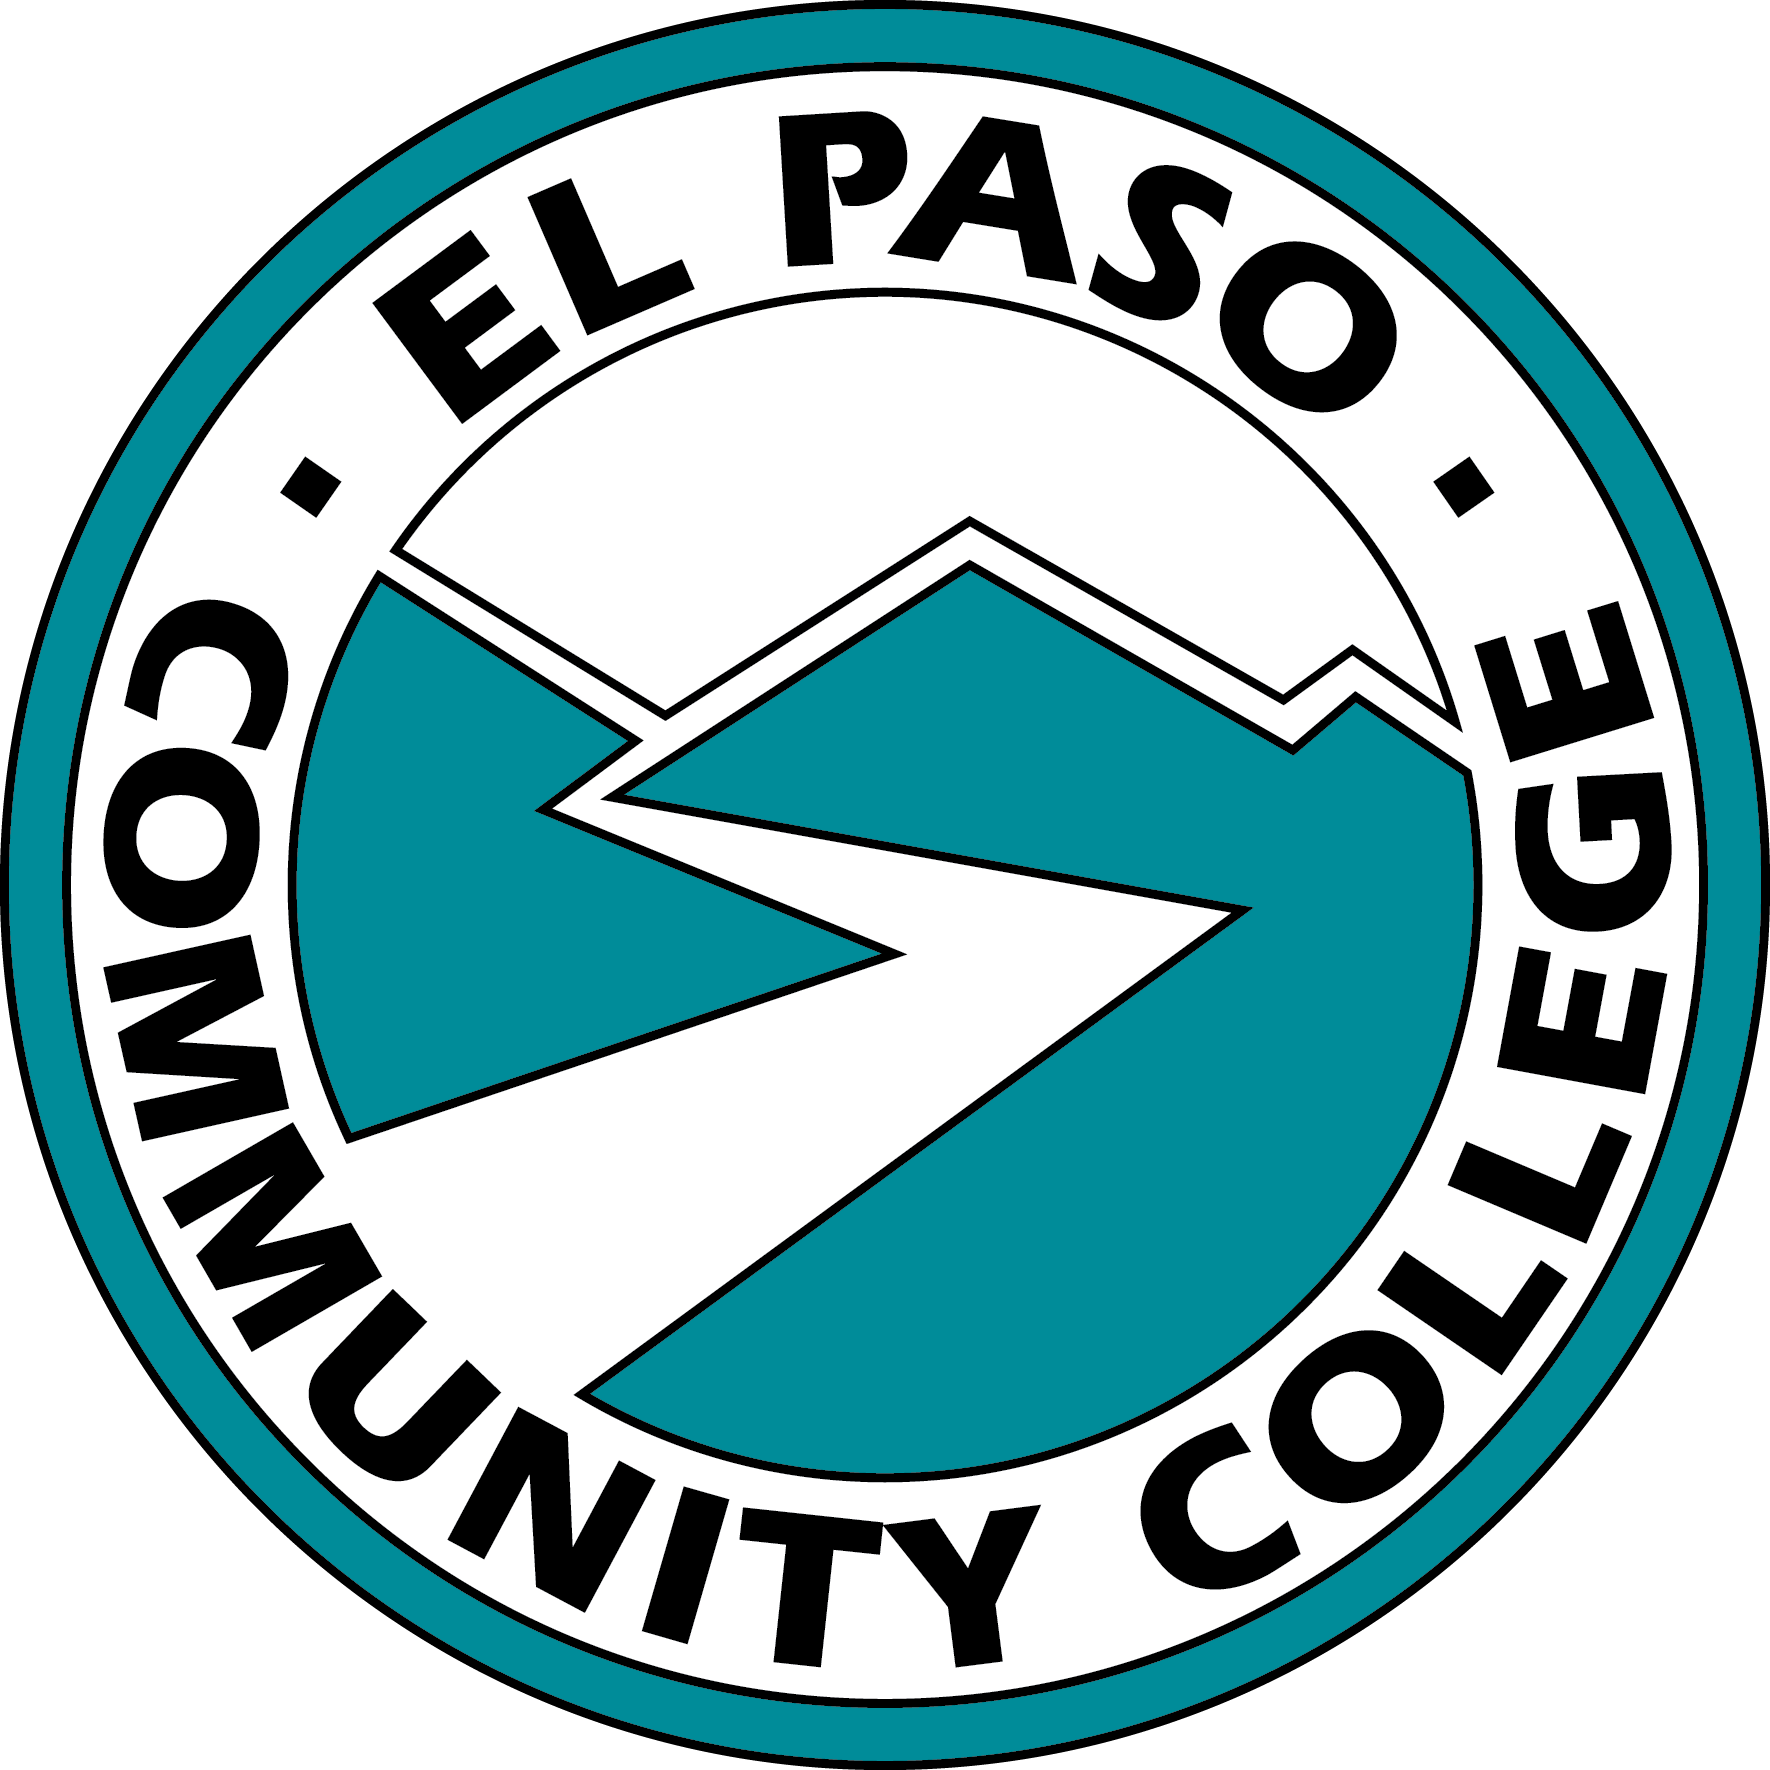 EPCC_logo-png.png